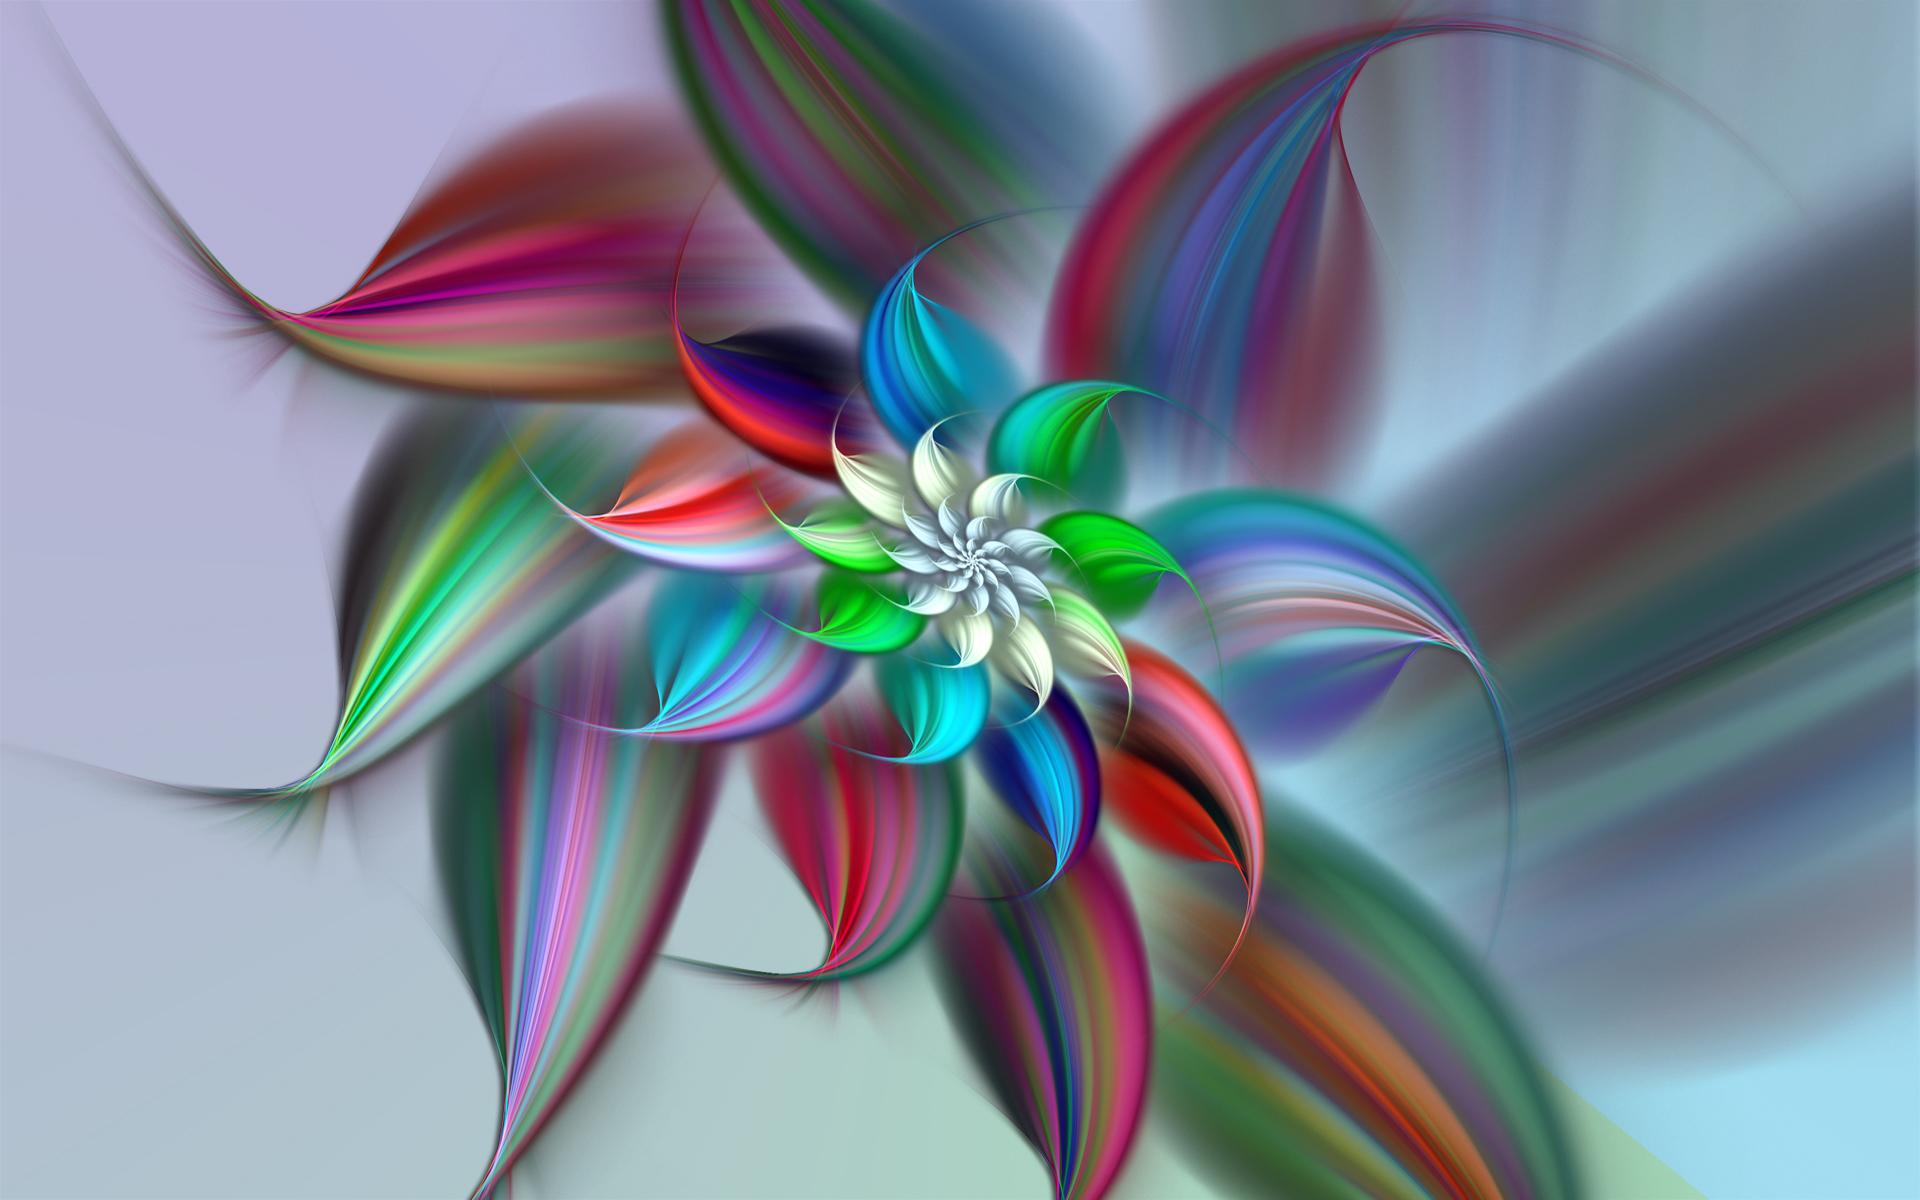 WinCustomize Explore Wallpapers April Flowers 1920x1200